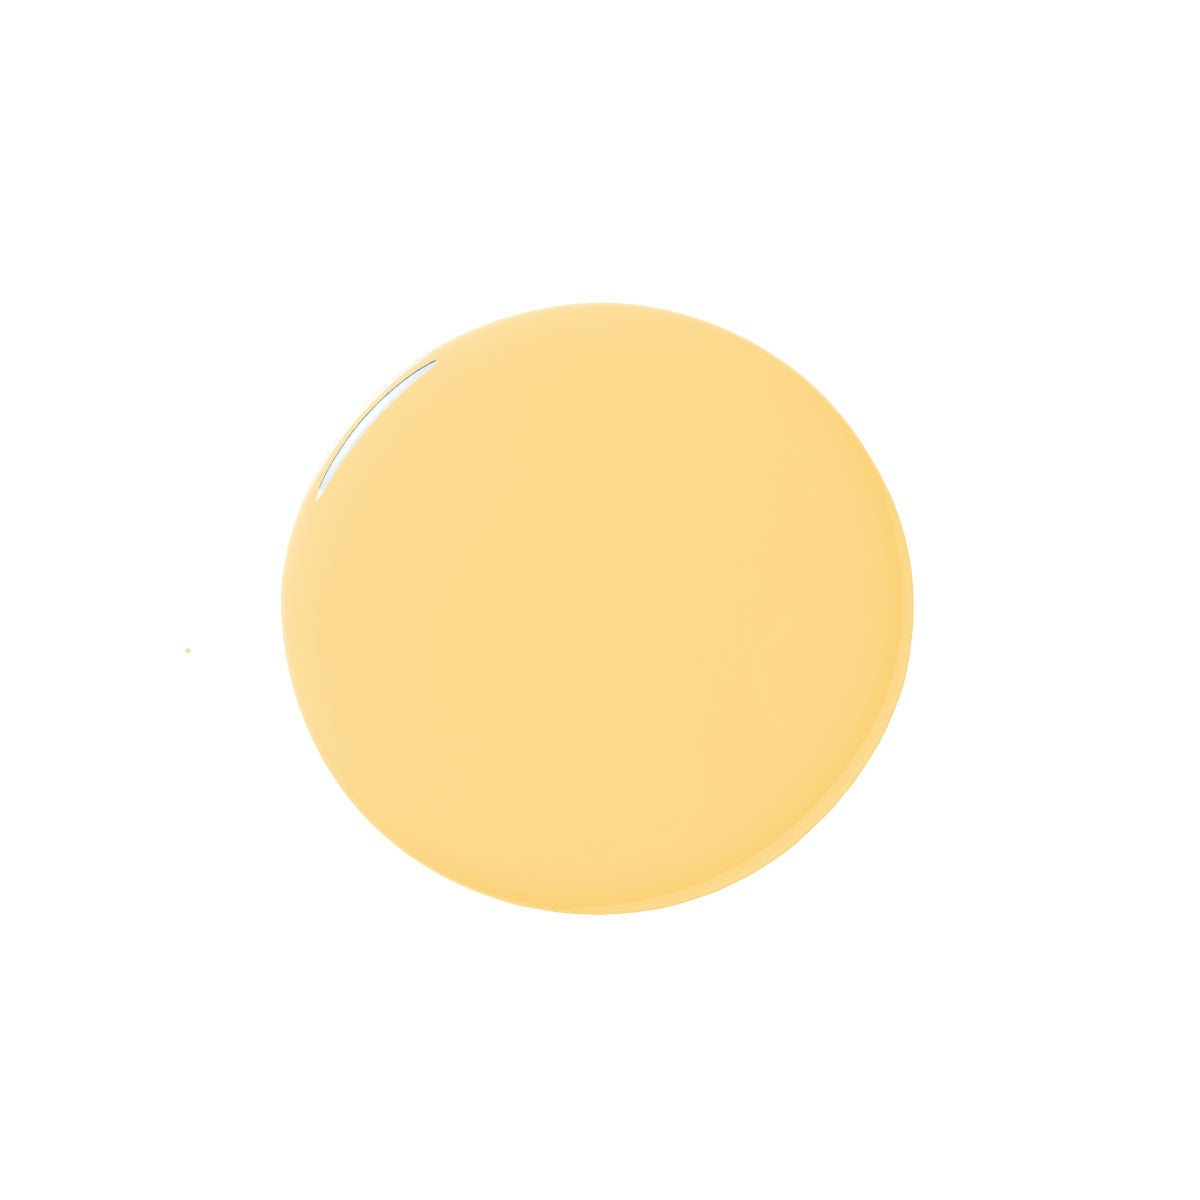 yellow paint blob